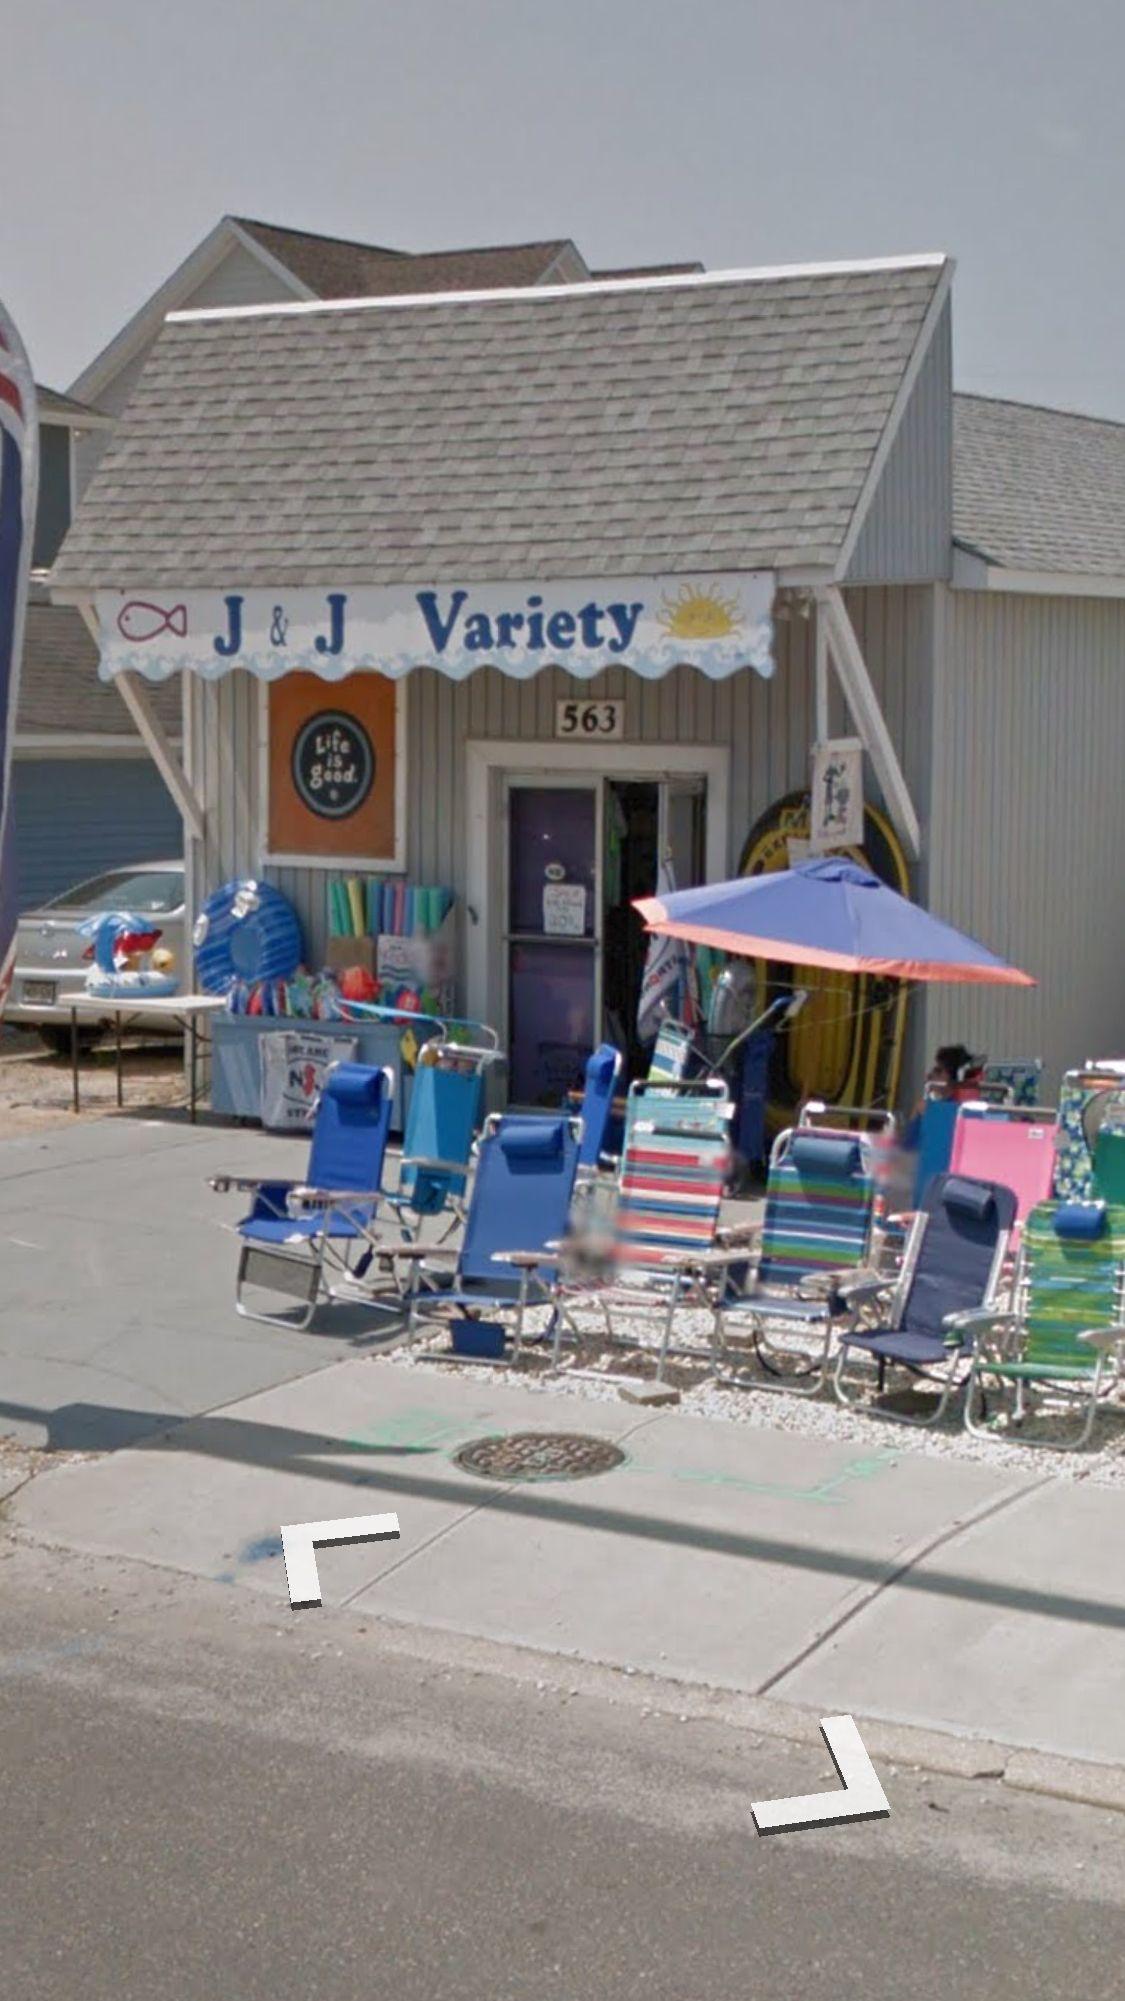 J J Variety 563 Rt 35 North Normandy Beach Nj Normandy Beach Normandy Hurricane Sandy